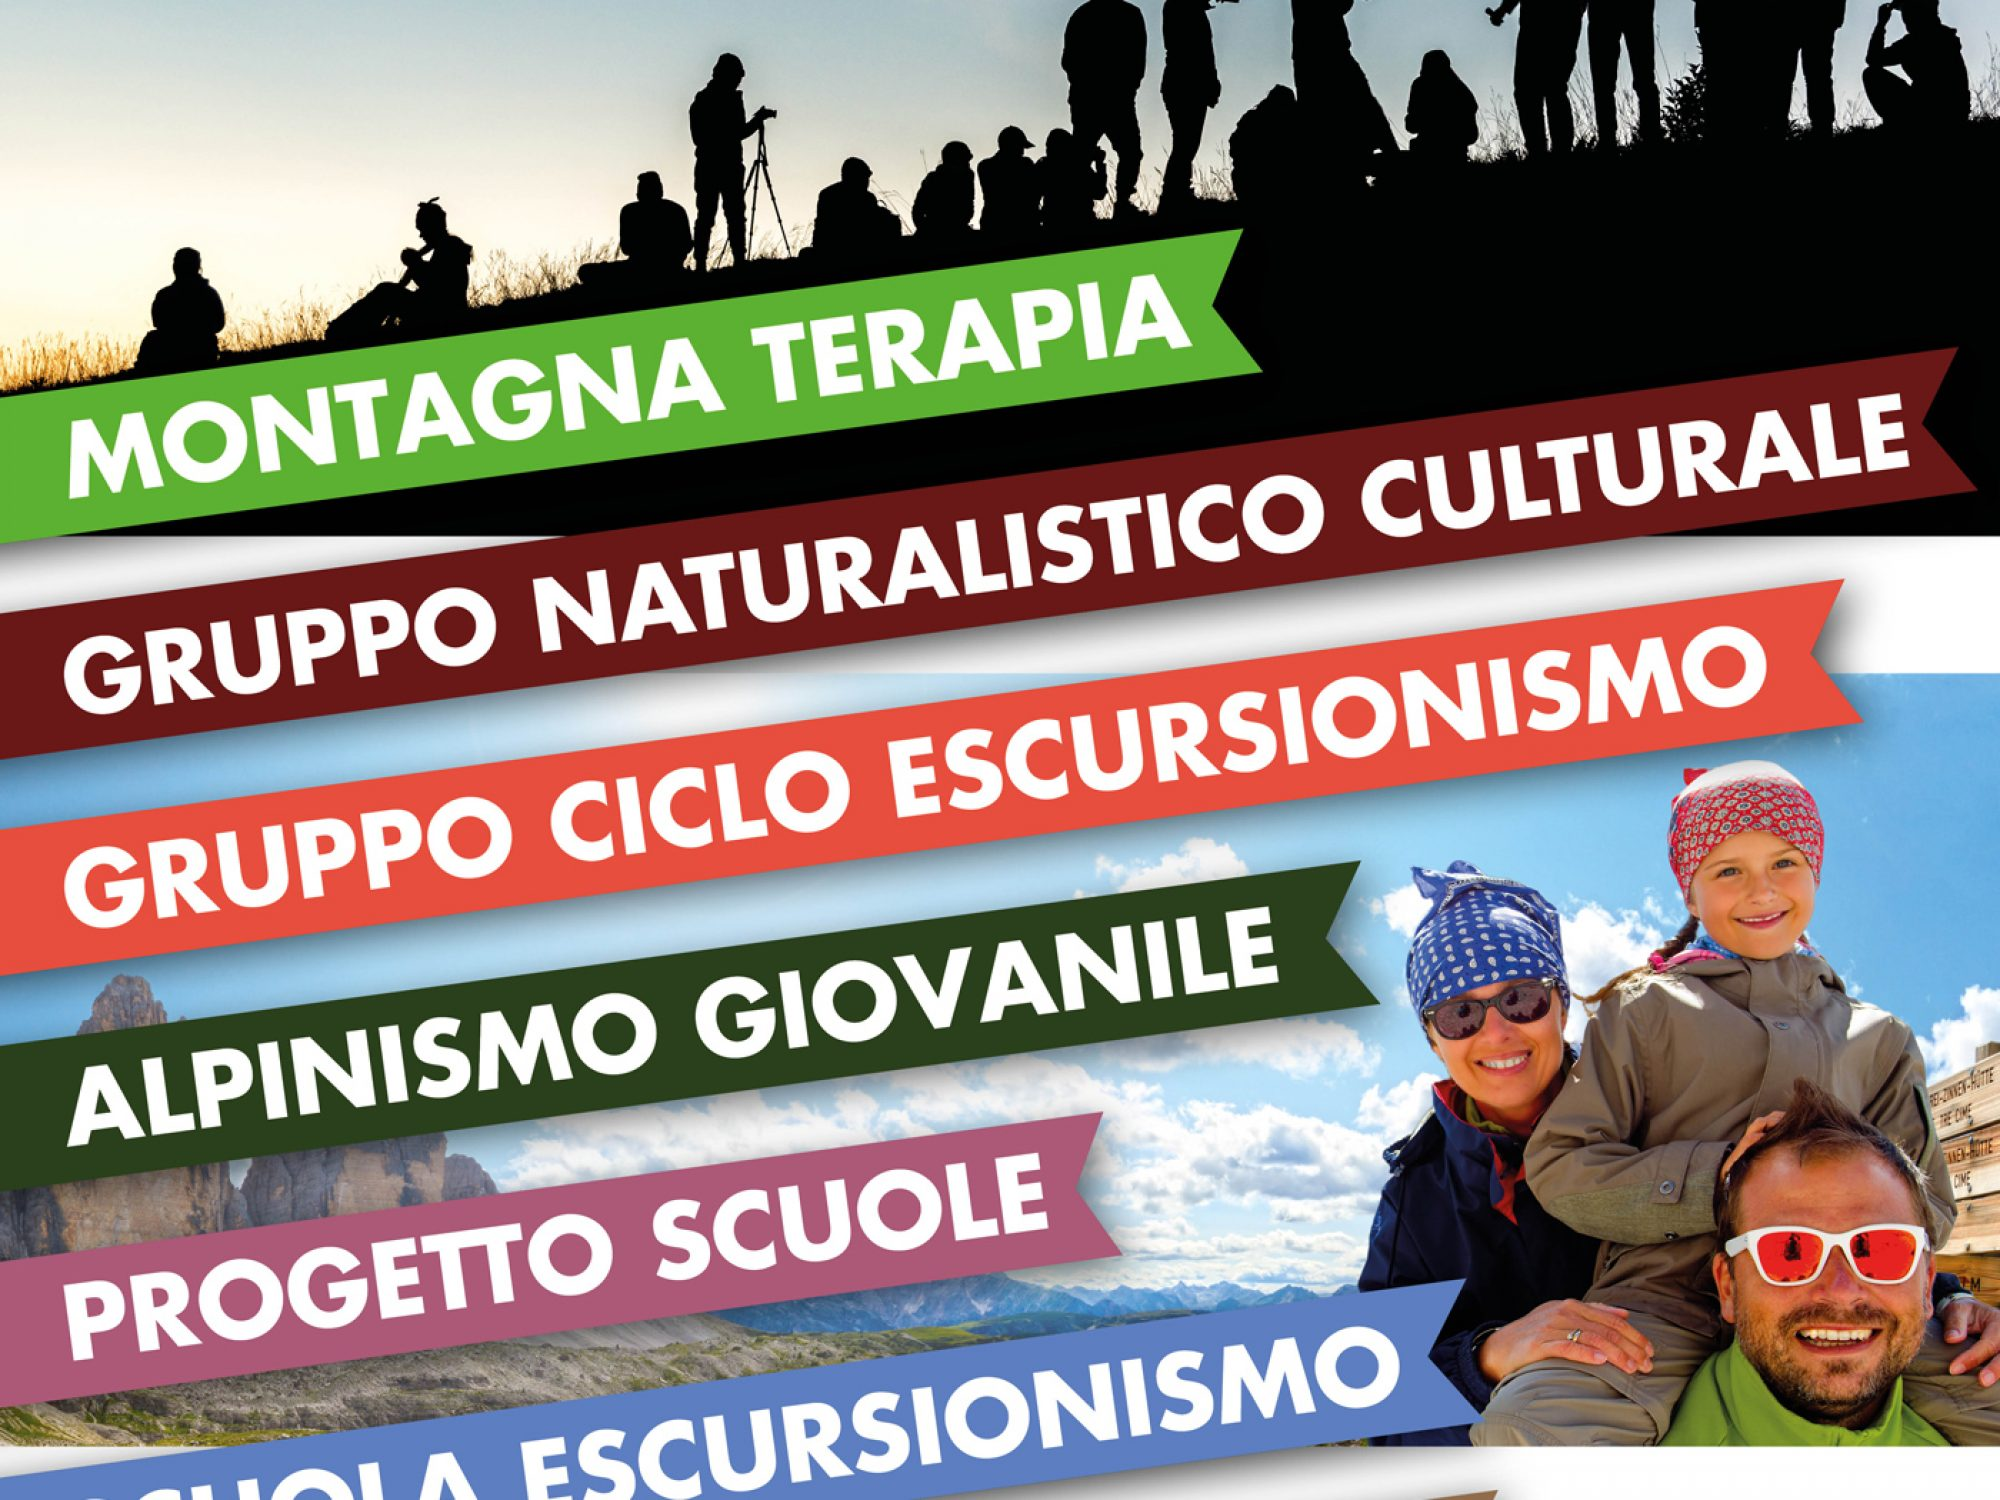 Signage for the Italian Alpine Club